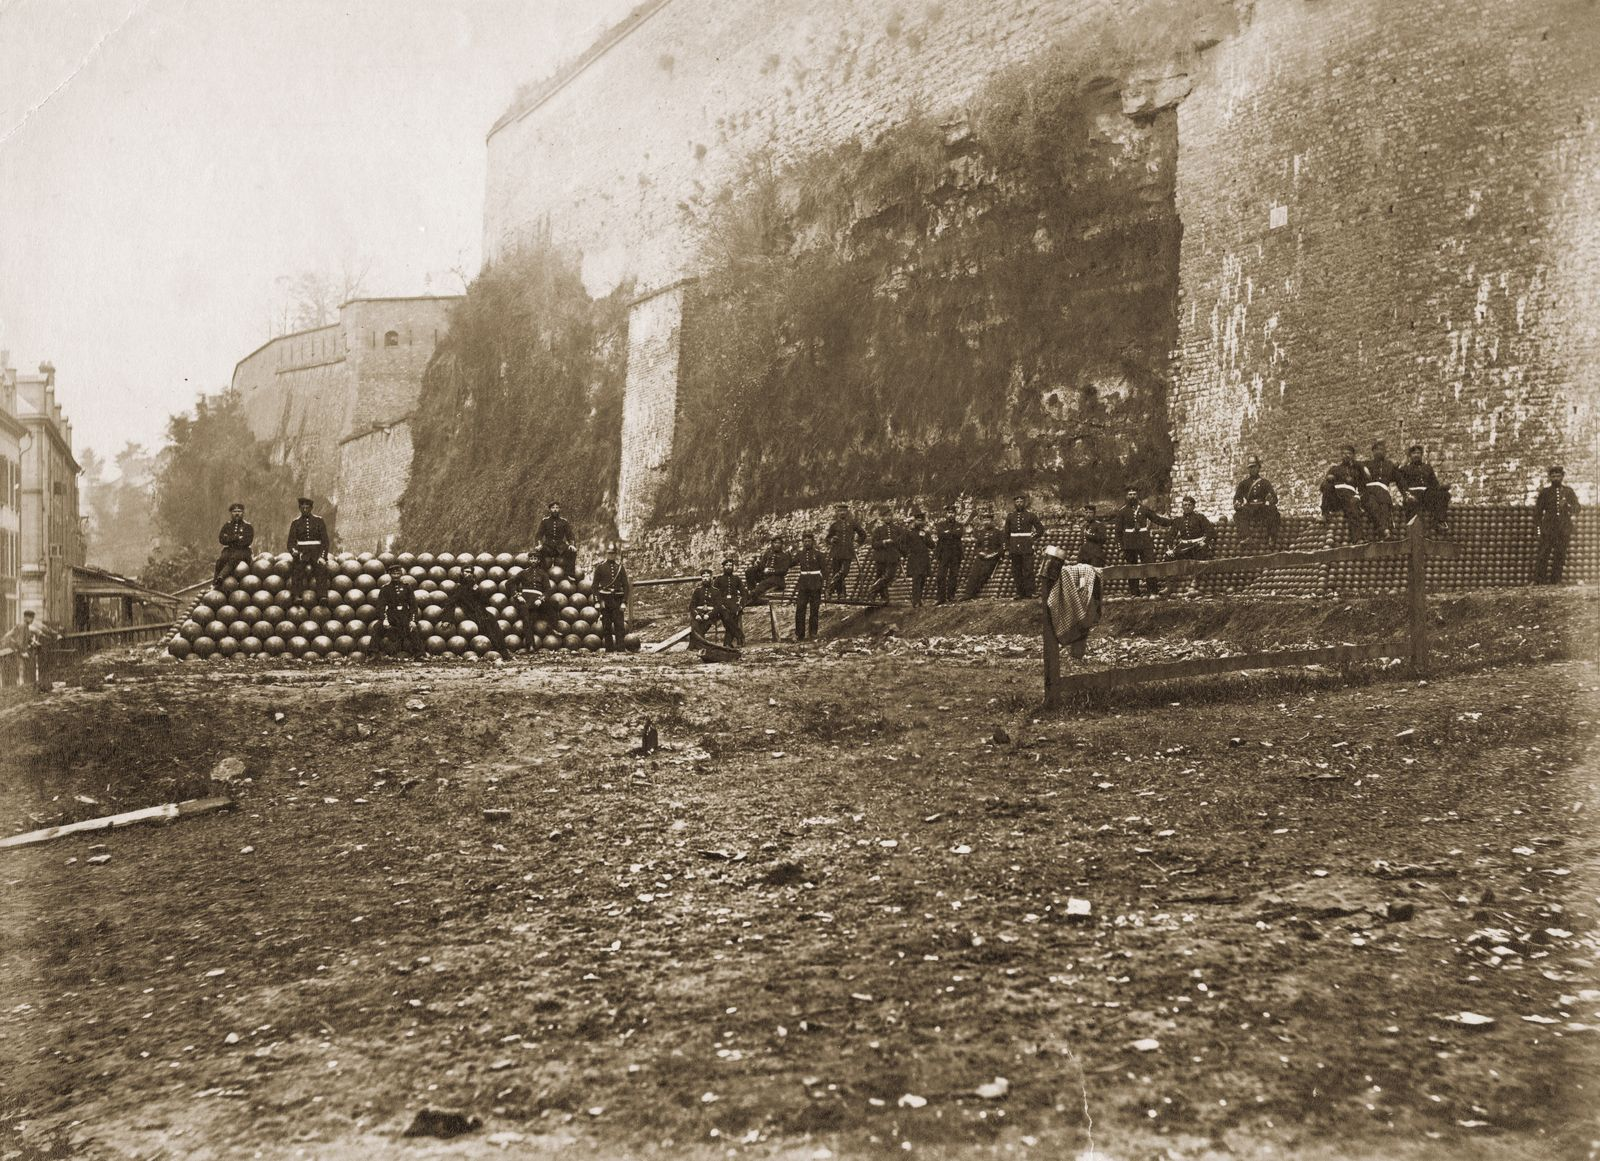 Prussians At Sedan